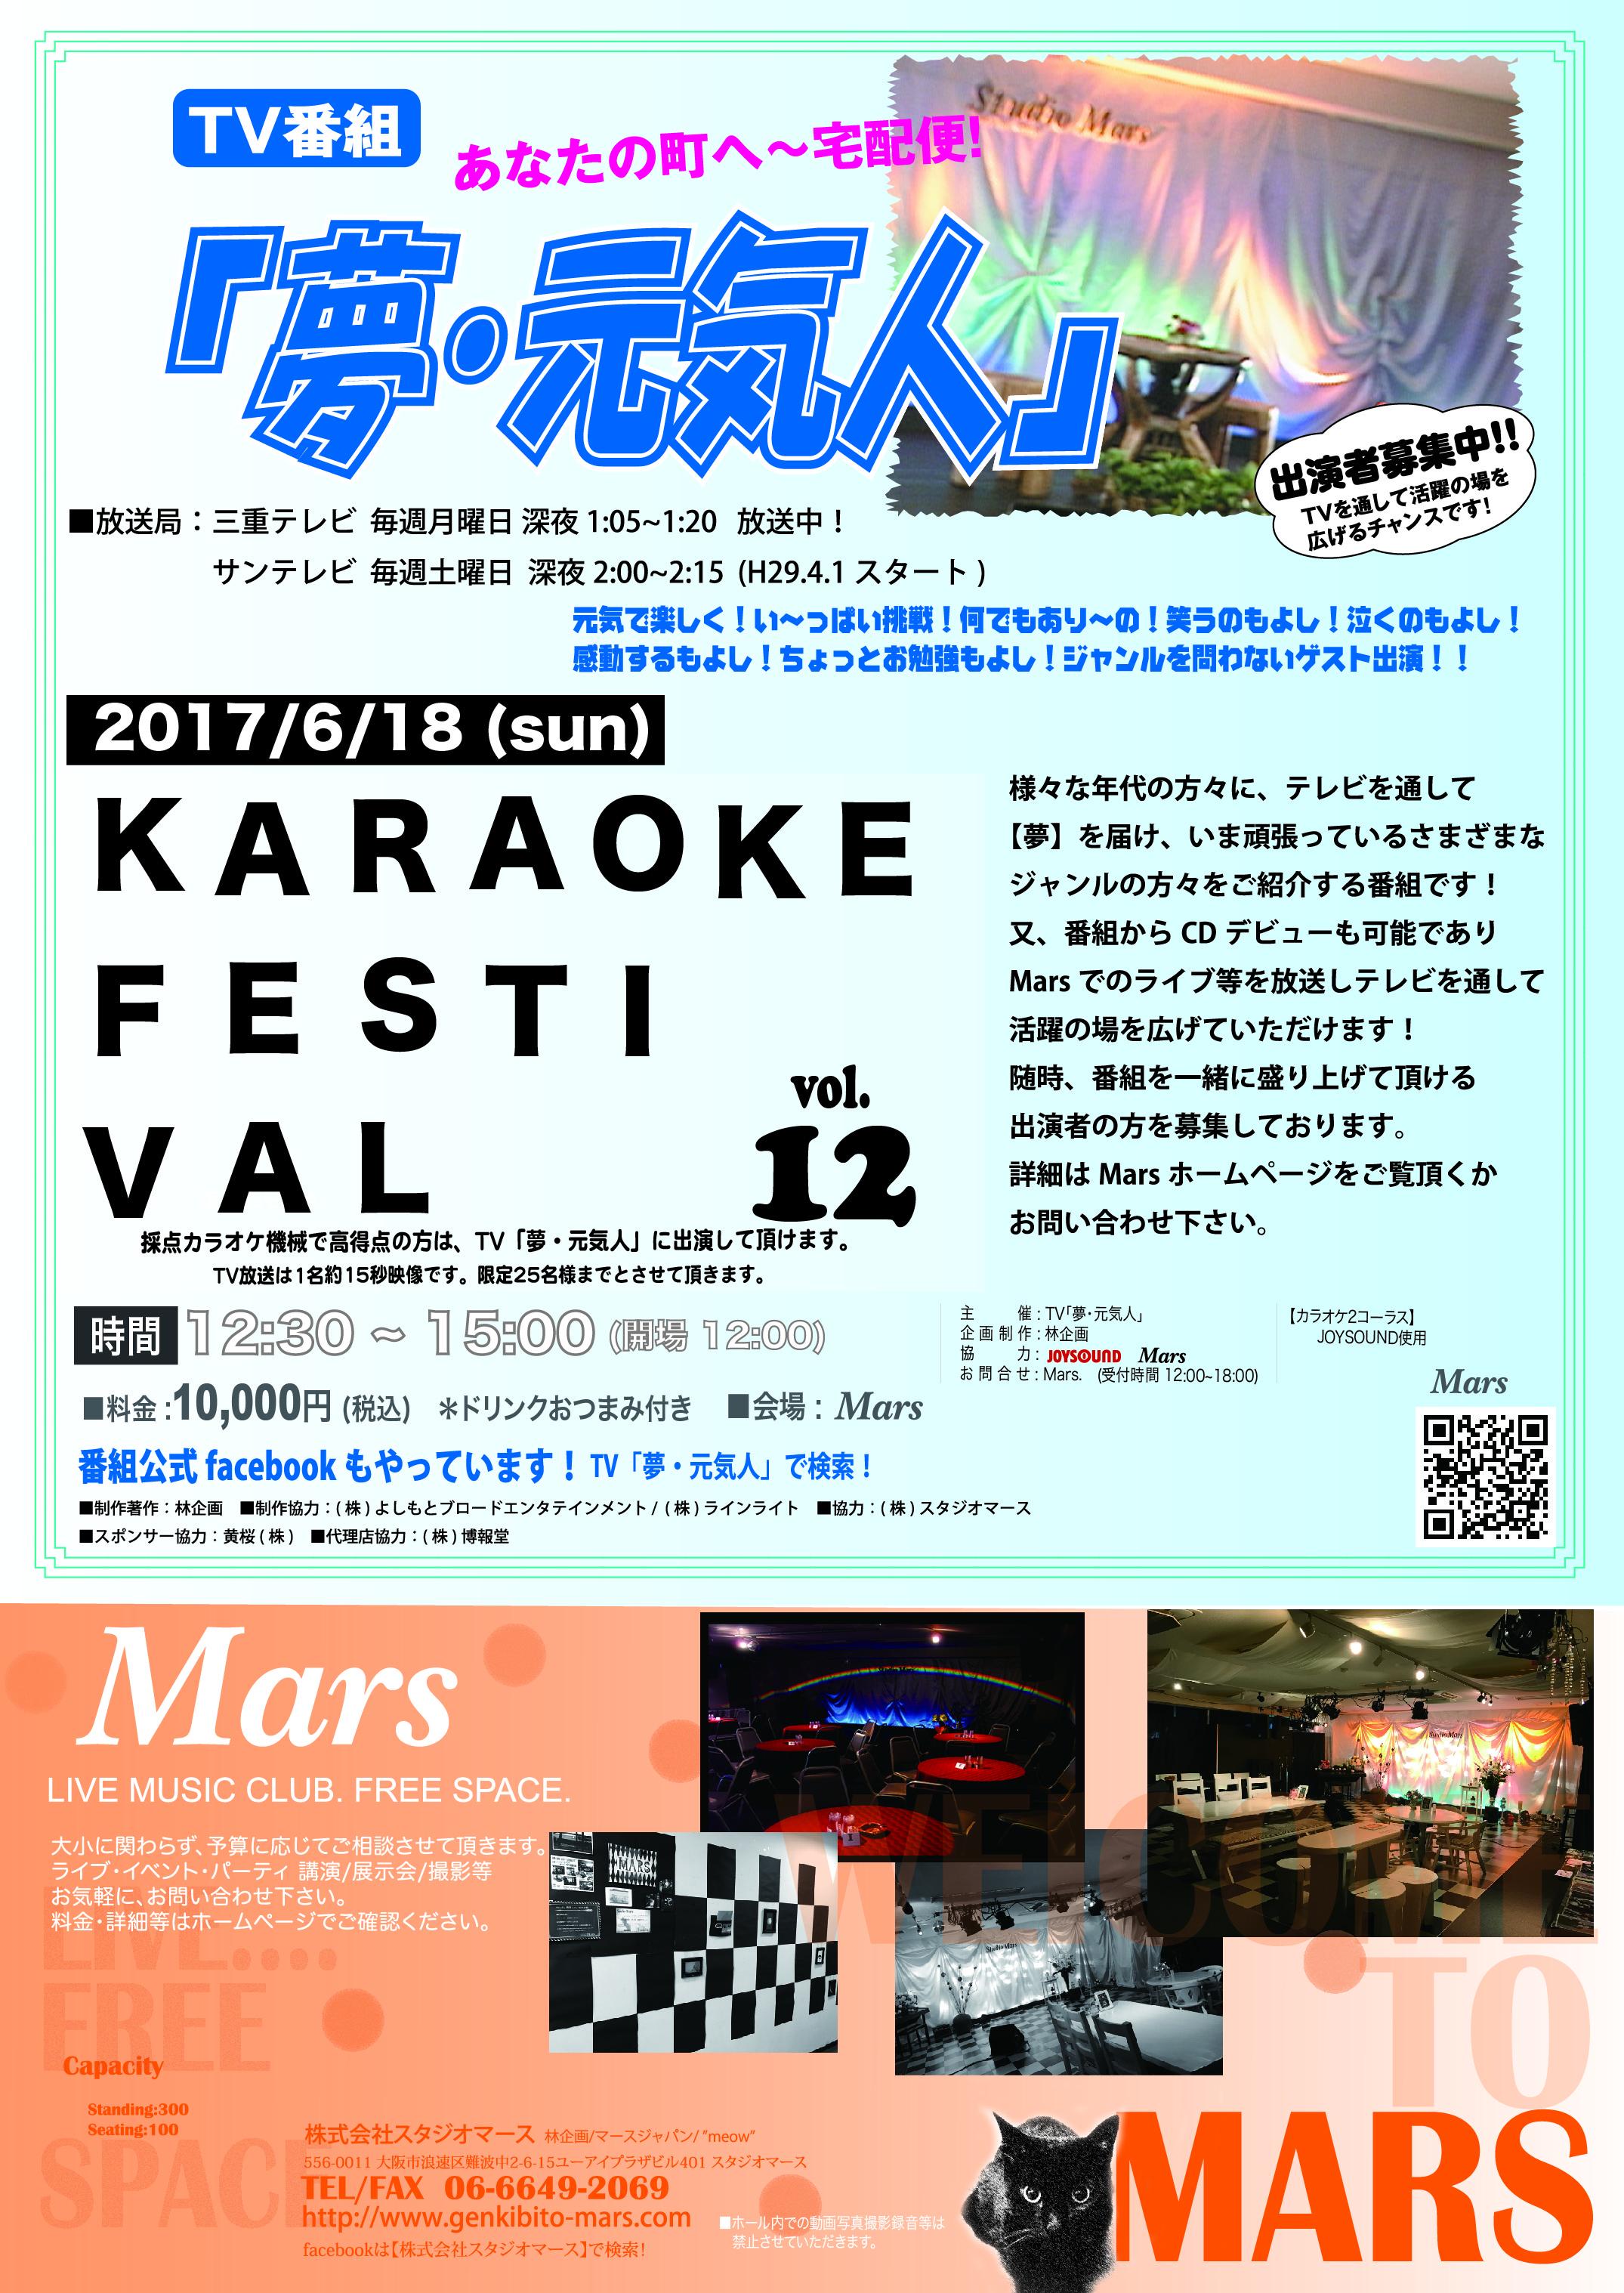 B5_tate omote [更新済み].eps のコピー-01.jpg